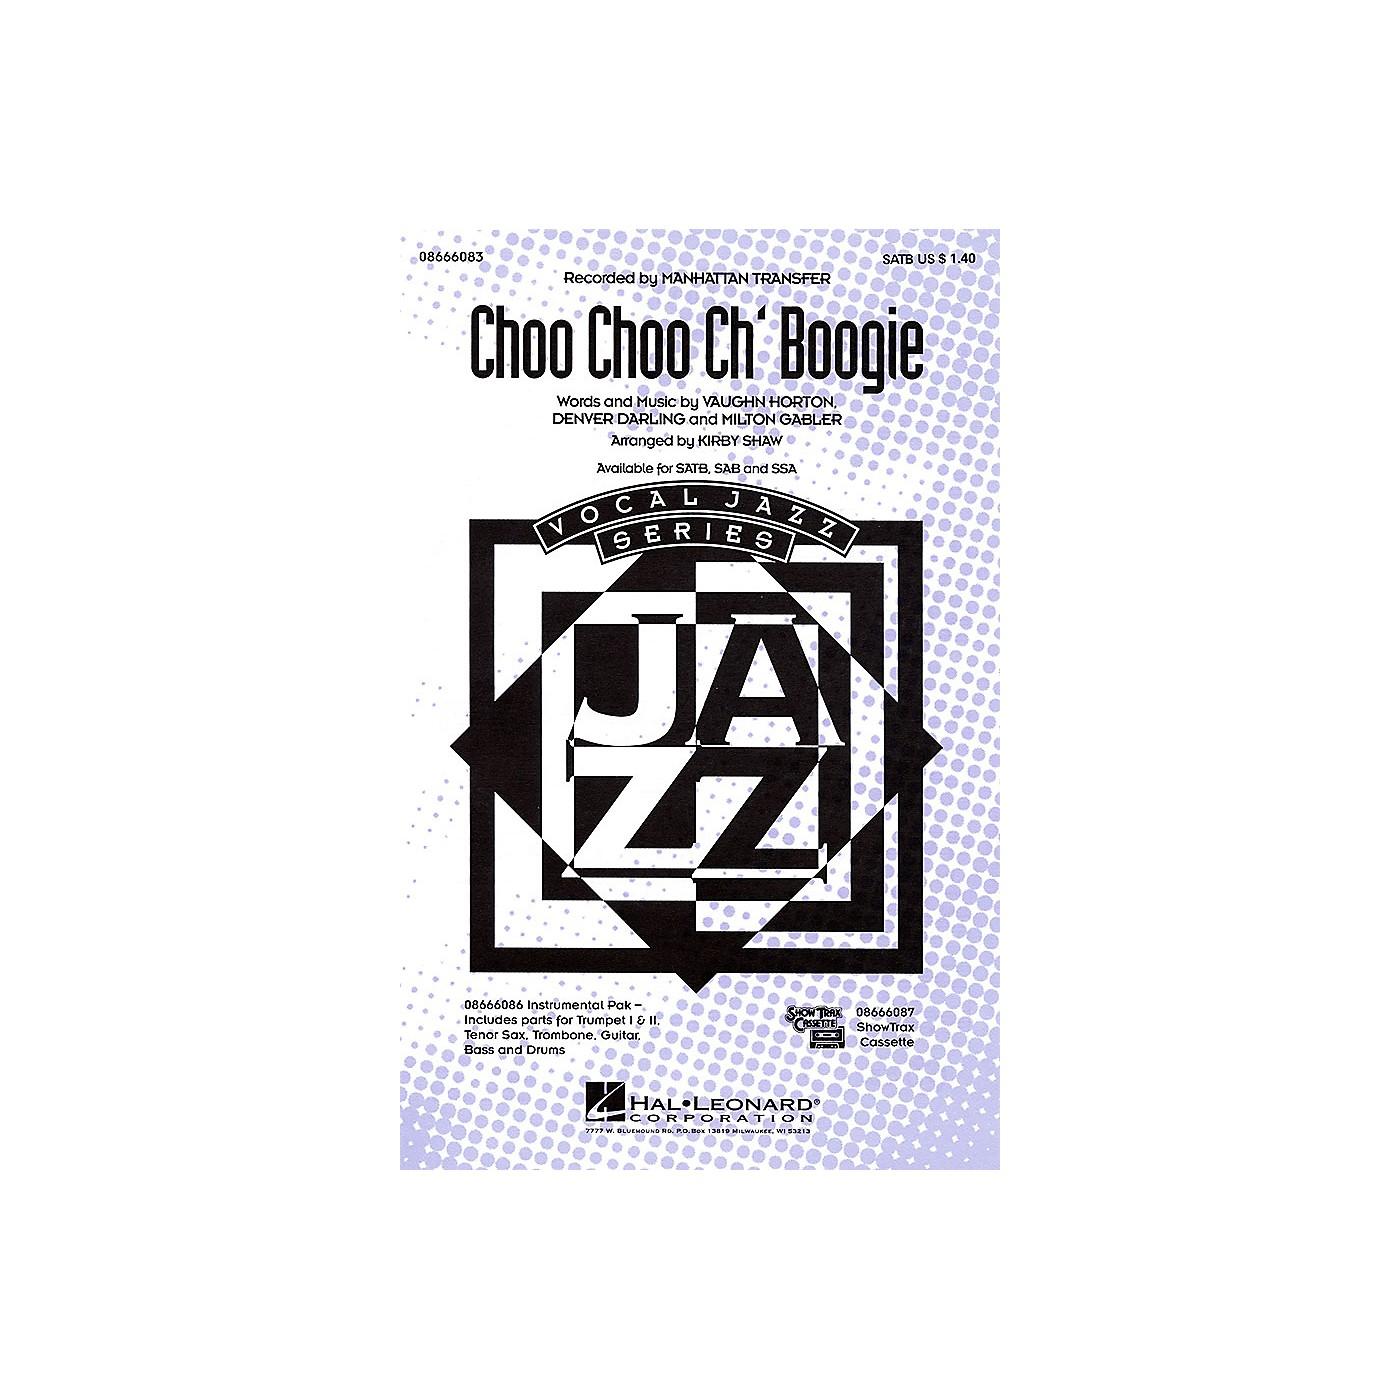 Hal Leonard Choo Choo Ch'Boogie SSA by The Manhattan Transfer Arranged by Kirby Shaw thumbnail